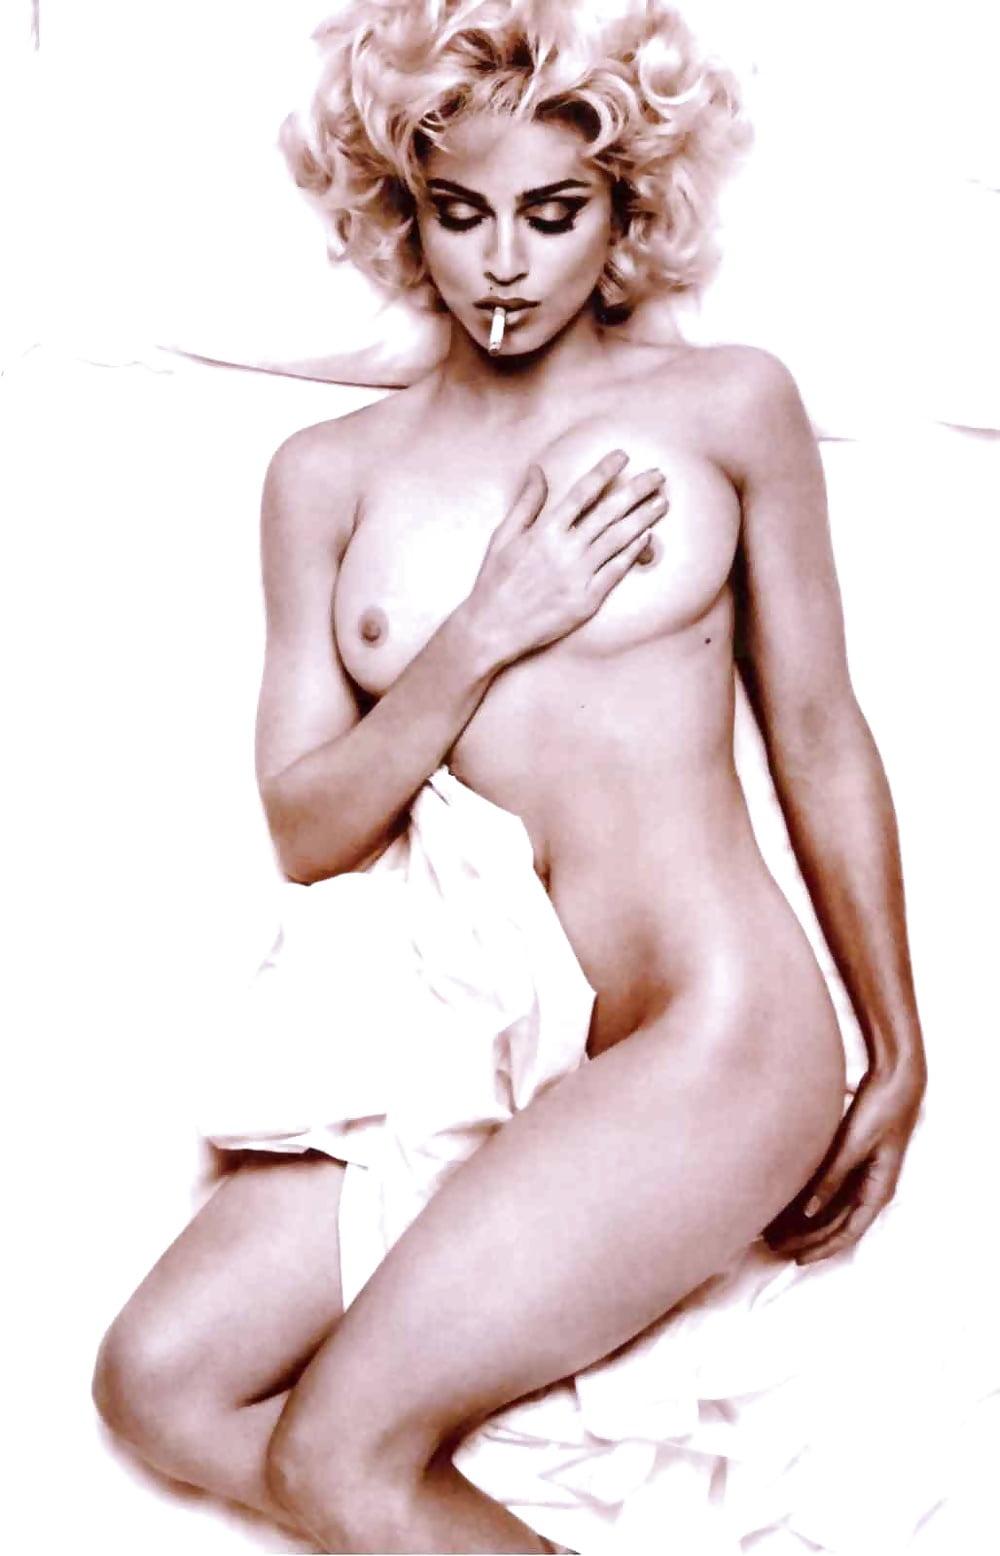 Madonna vintage playboy photos erotic photos of celebrities and sexy actresses